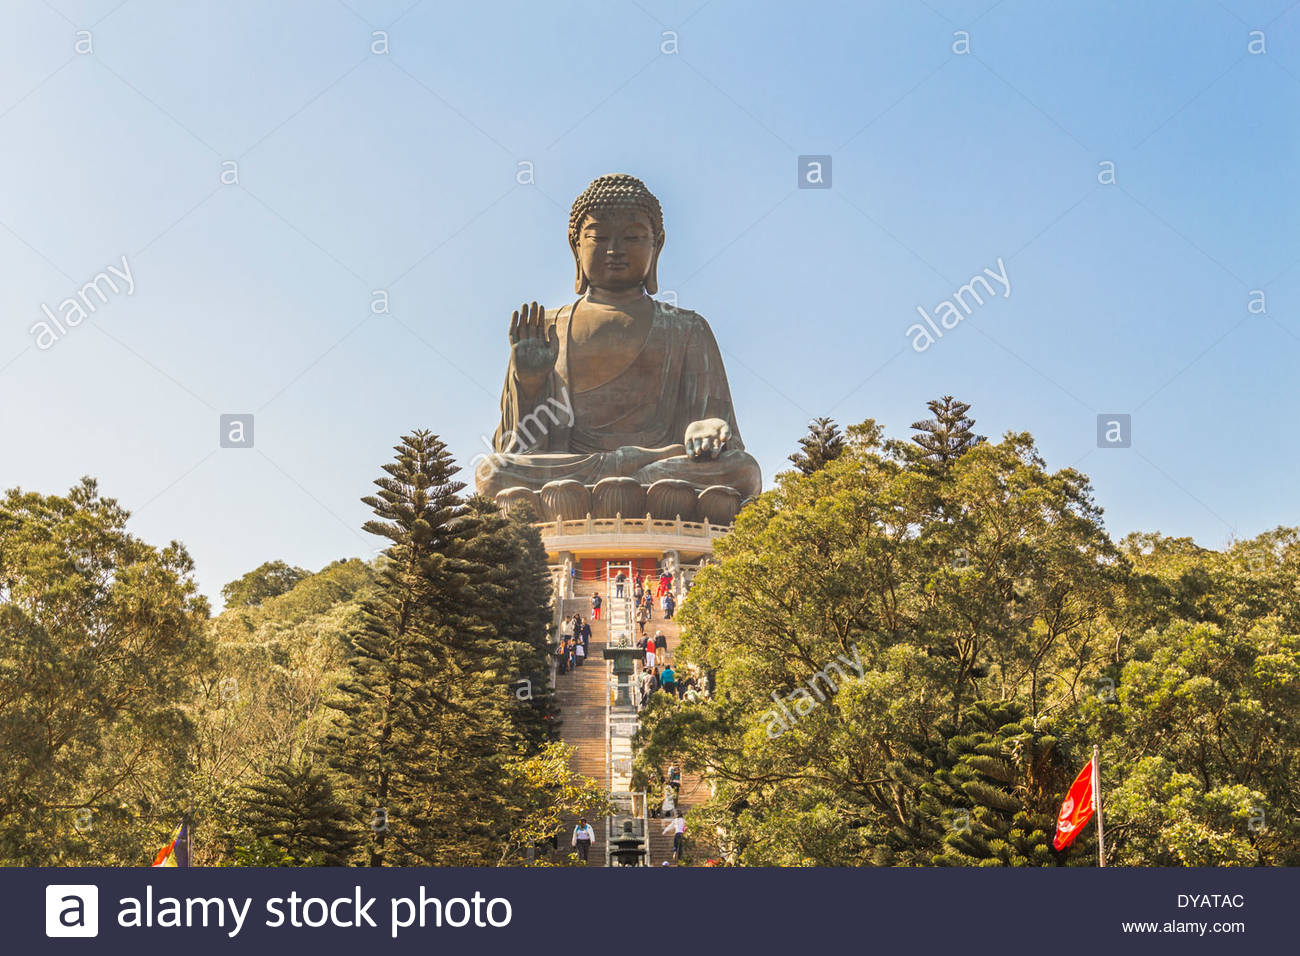 Tian Tan bronze buddha on Lantau Island, Hong Kong. It is 34 metres tall. - Stock Image